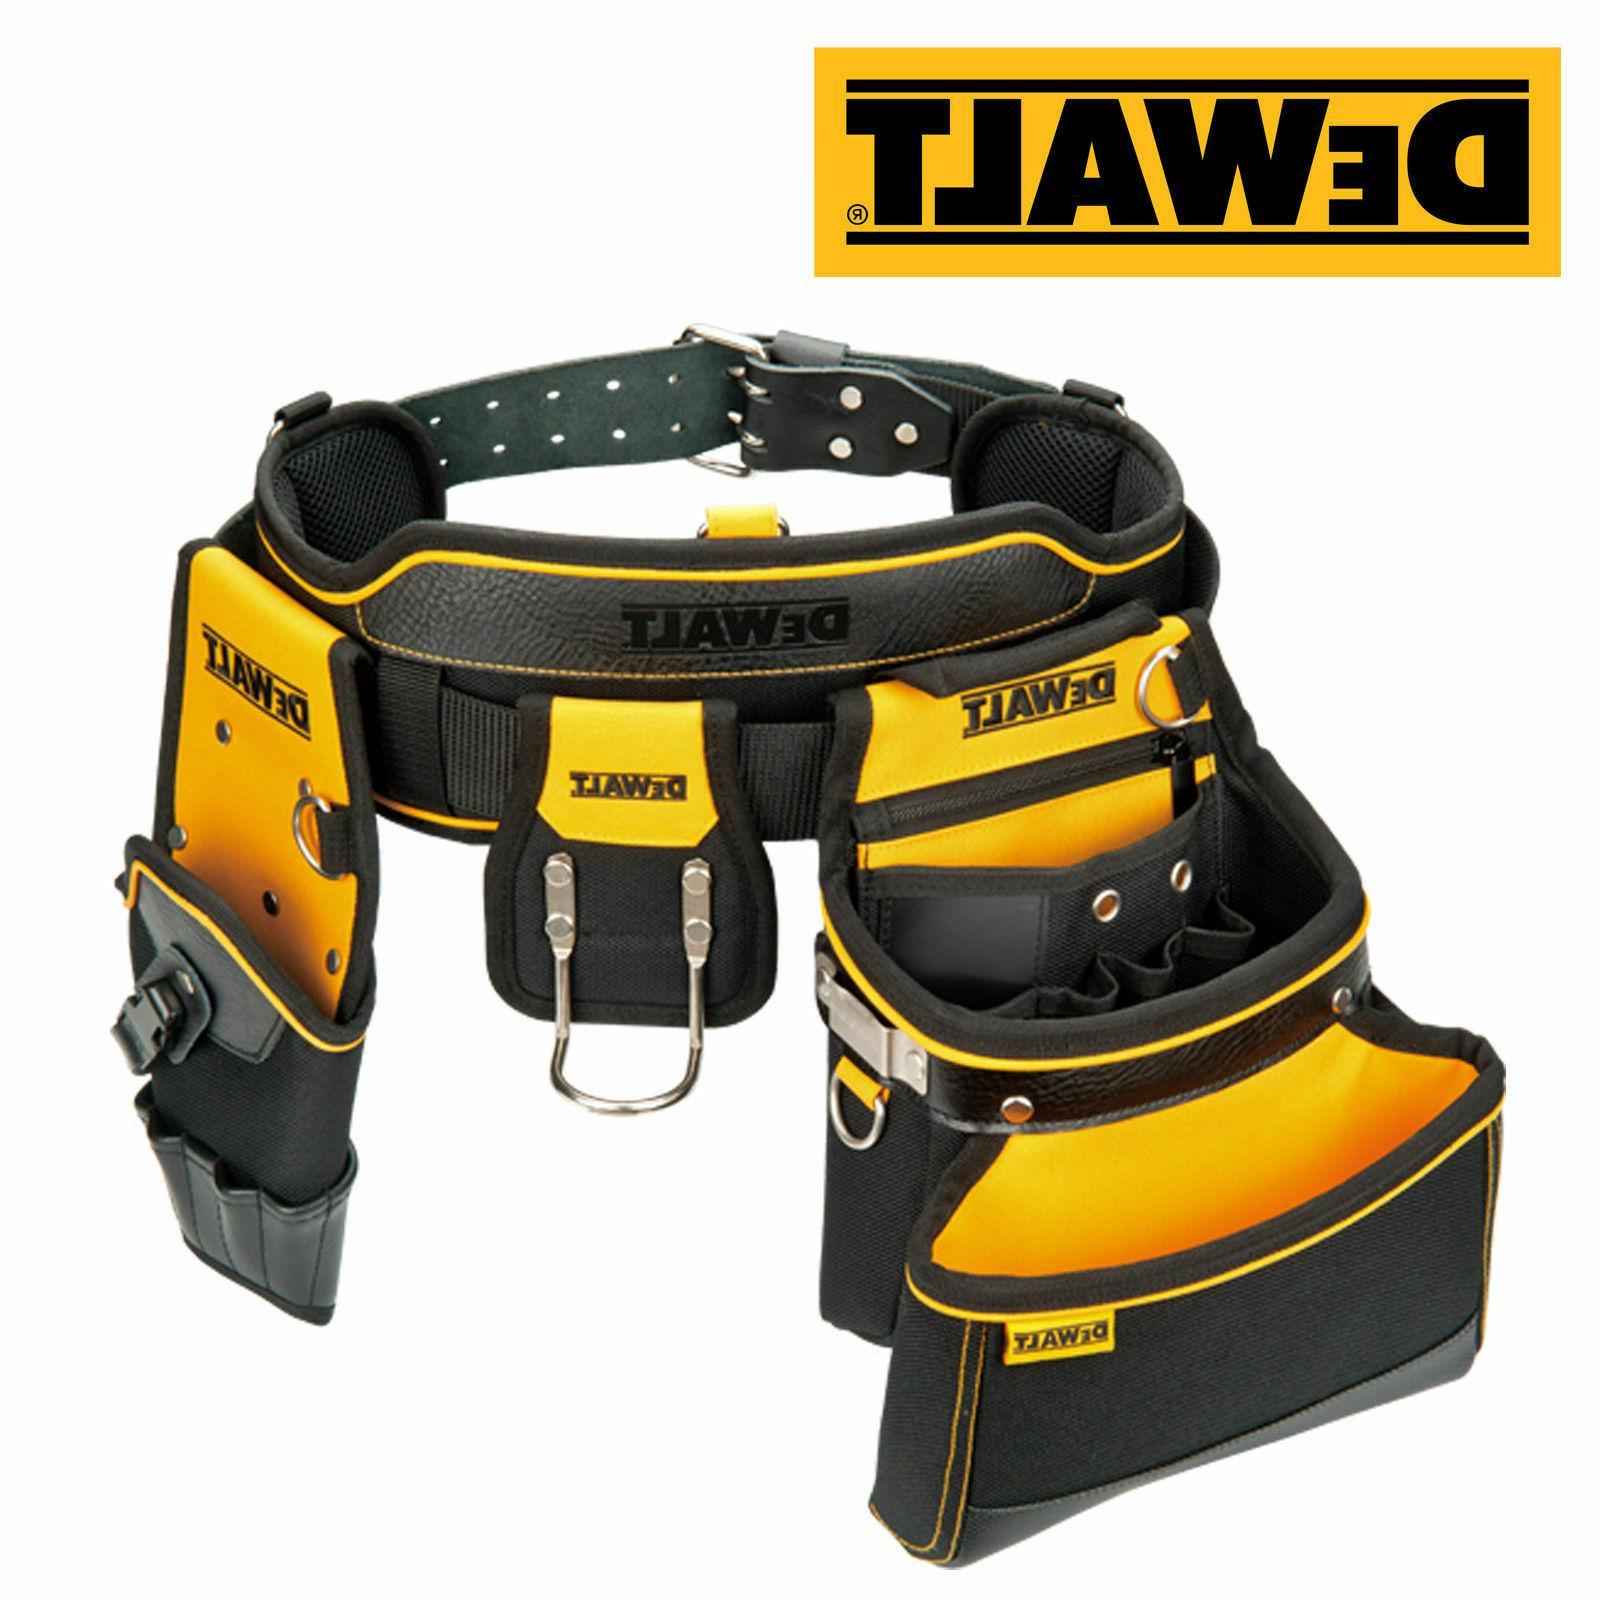 dwst81228 8 dwst1 75552 pouch set heavy